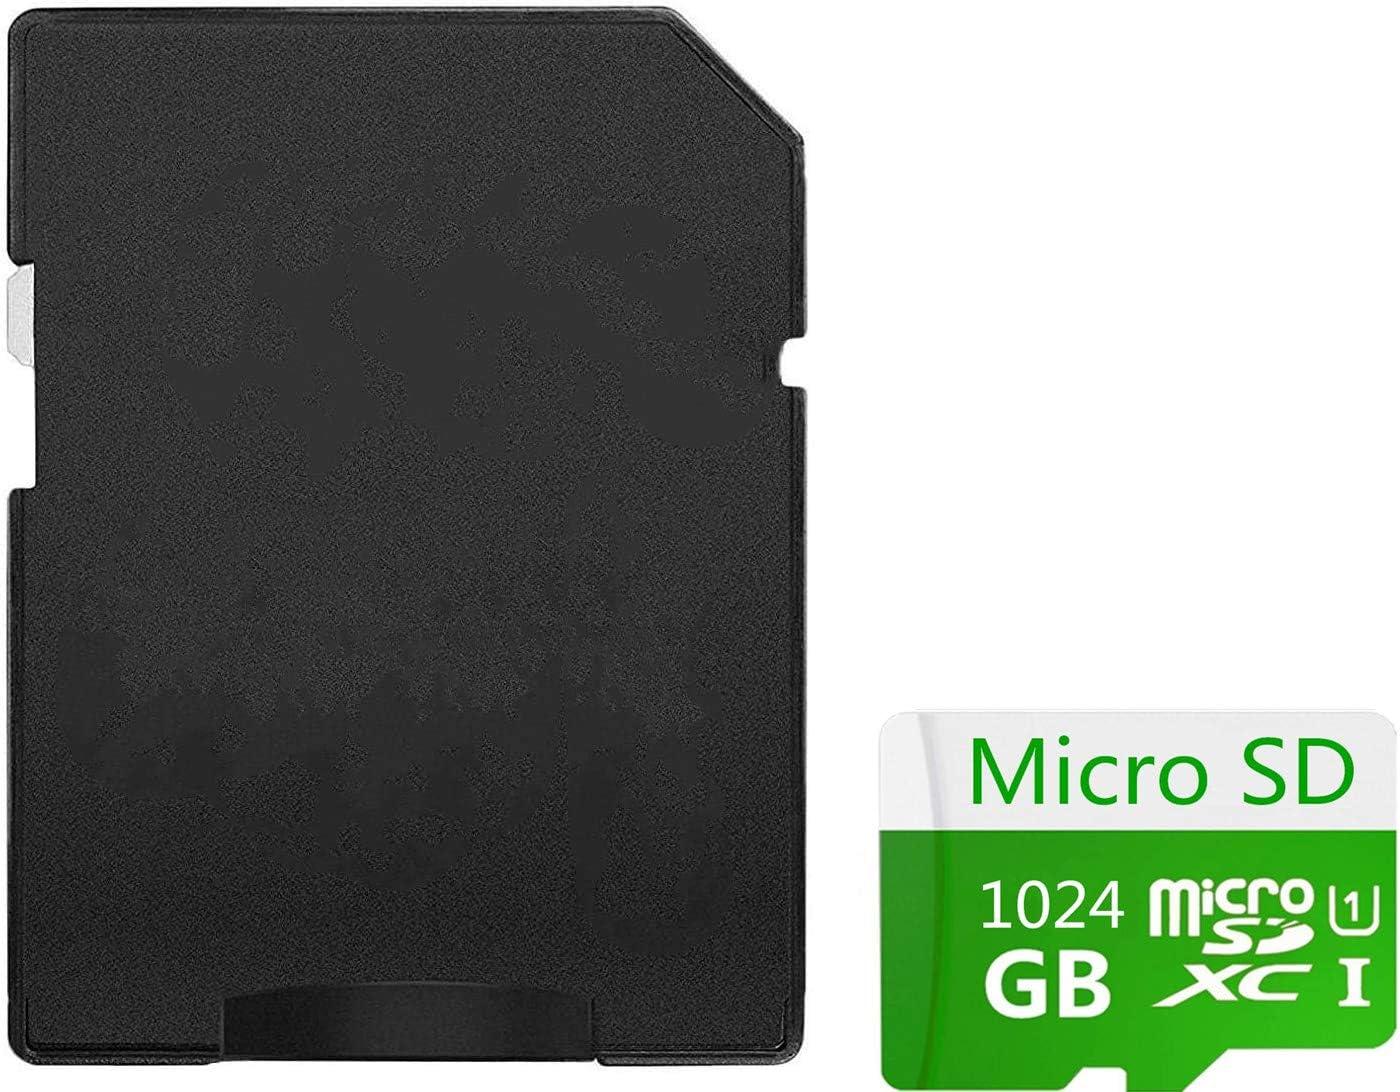 1024GB Micro SD SDXC Card High Speed Class 10 SDXC Card TF Memory Card with Adapter (B-1024GB)